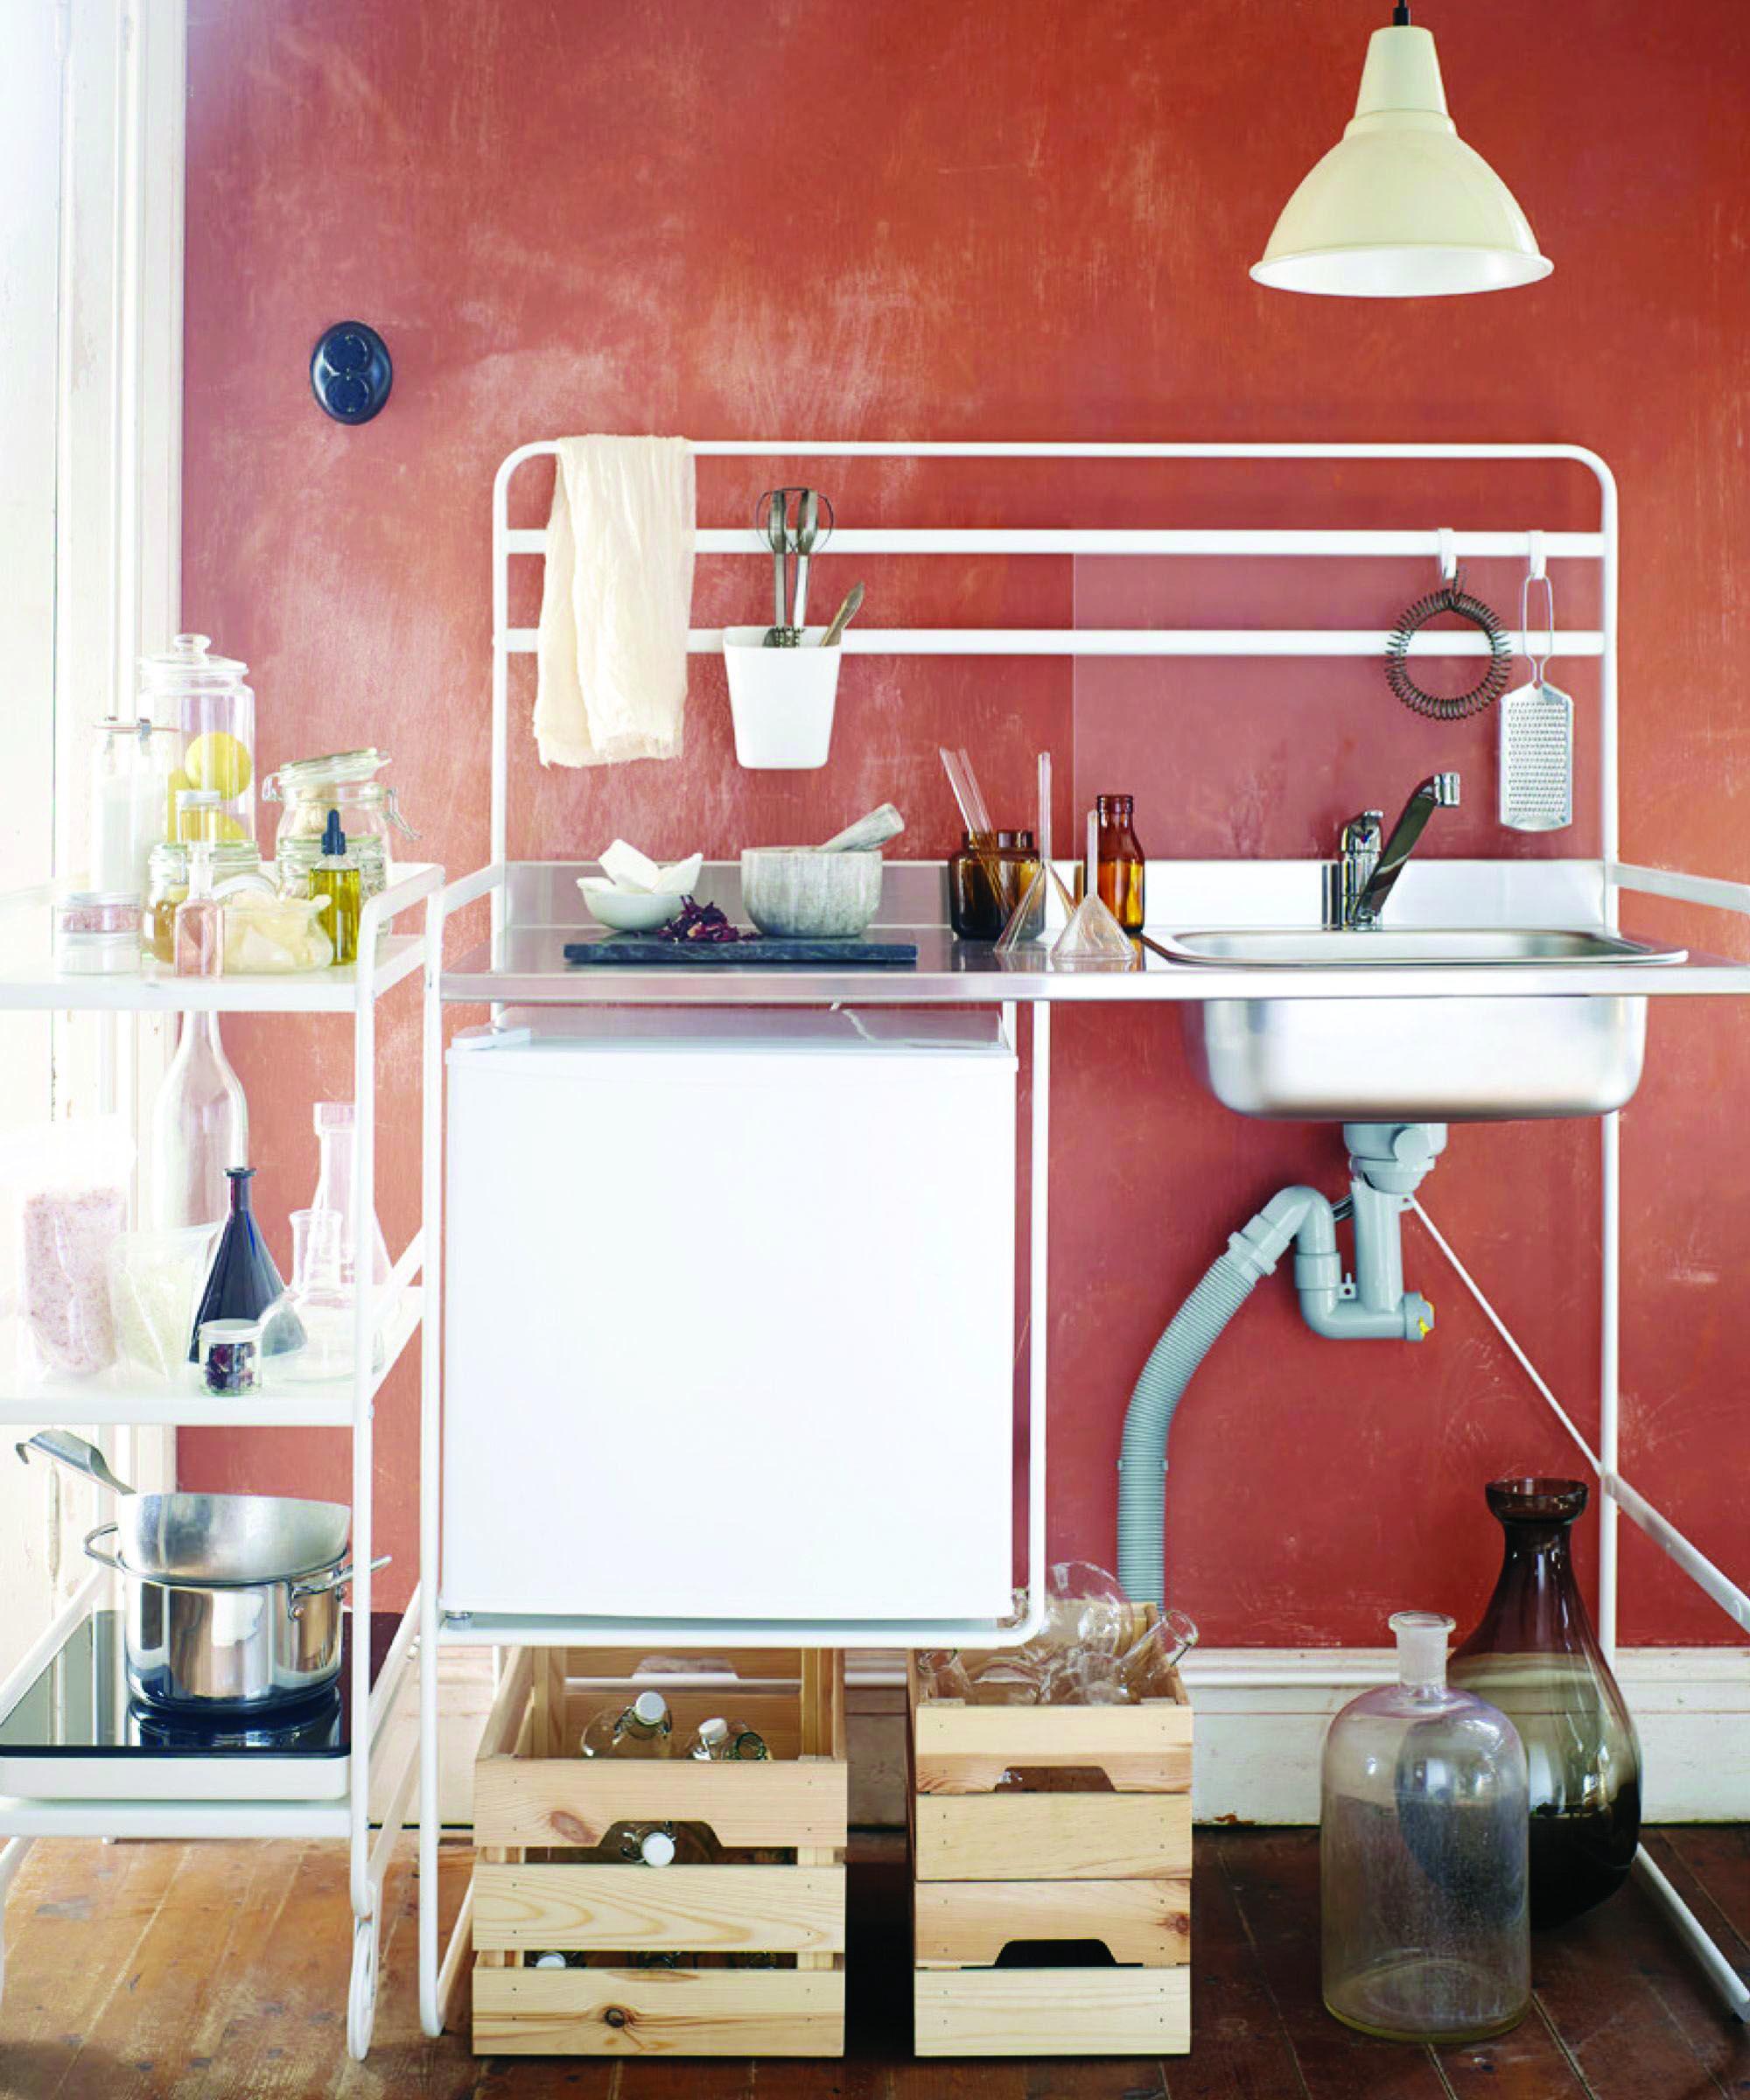 16 Flexible Freestanding Kitchen Area Suggestions Mini Kitchen Freestanding Kitchen Kitchen Units